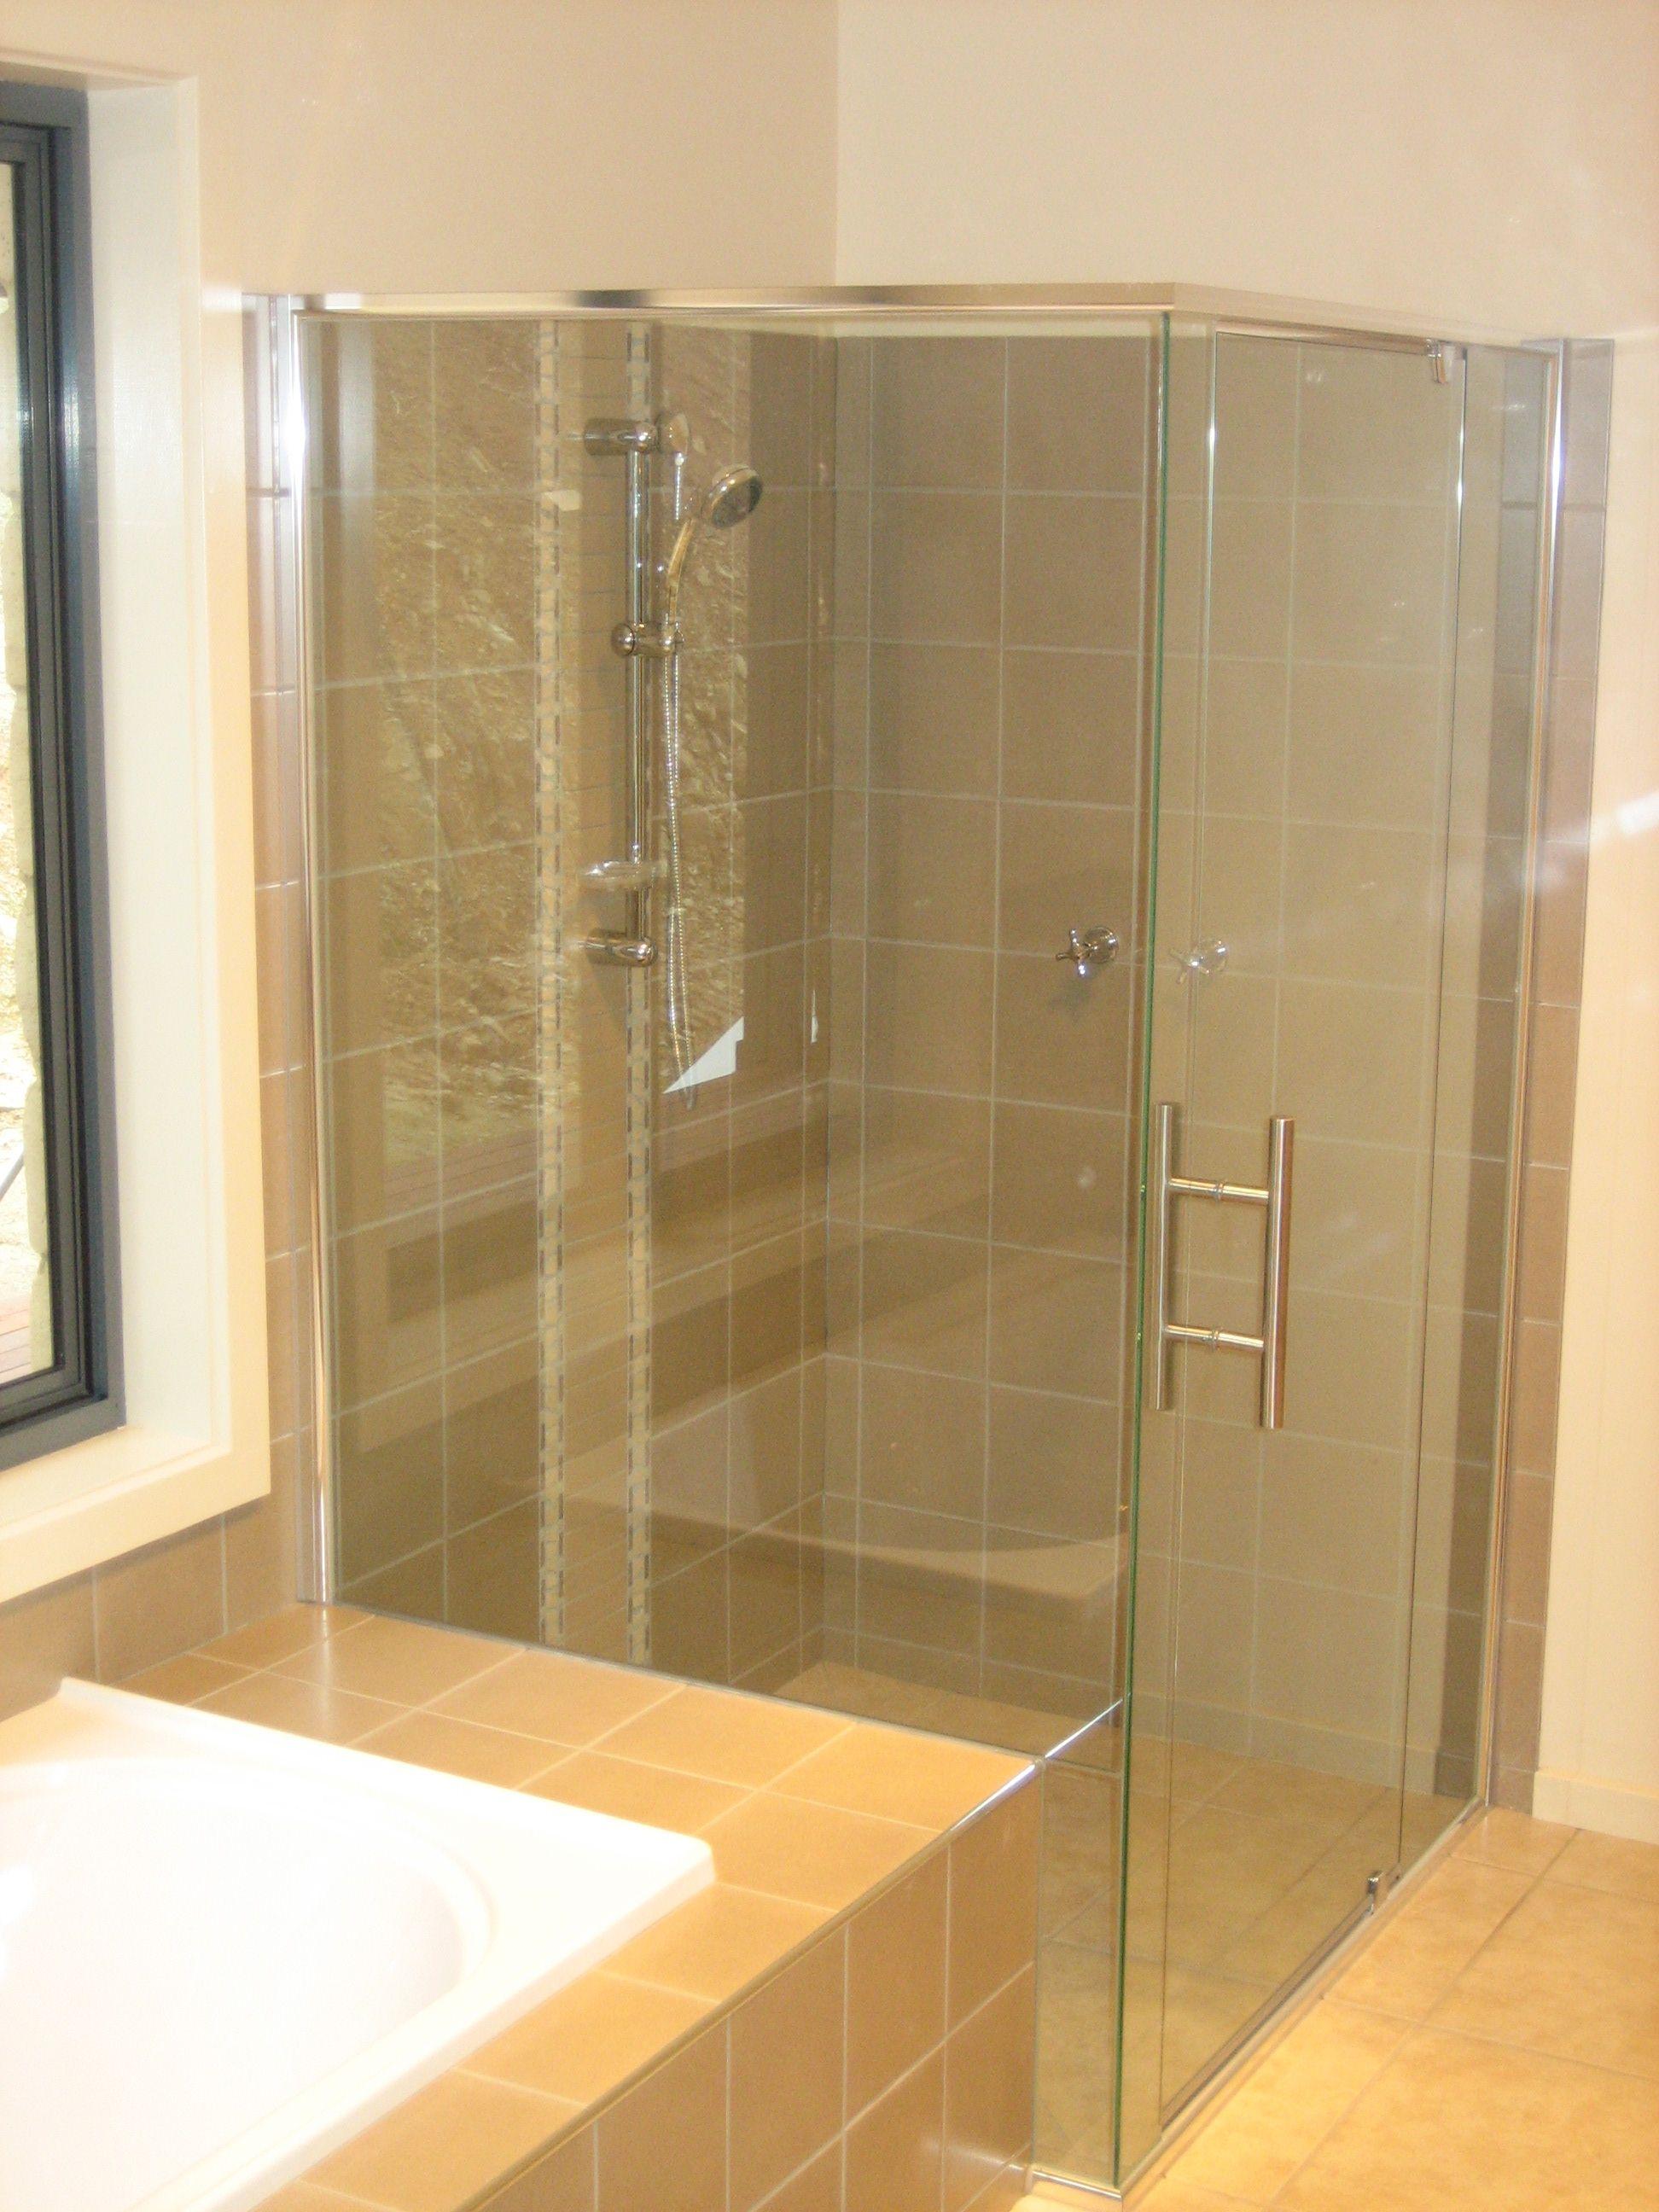 Shower Screen Door Flap Httpsourceabl Pinterest Shower